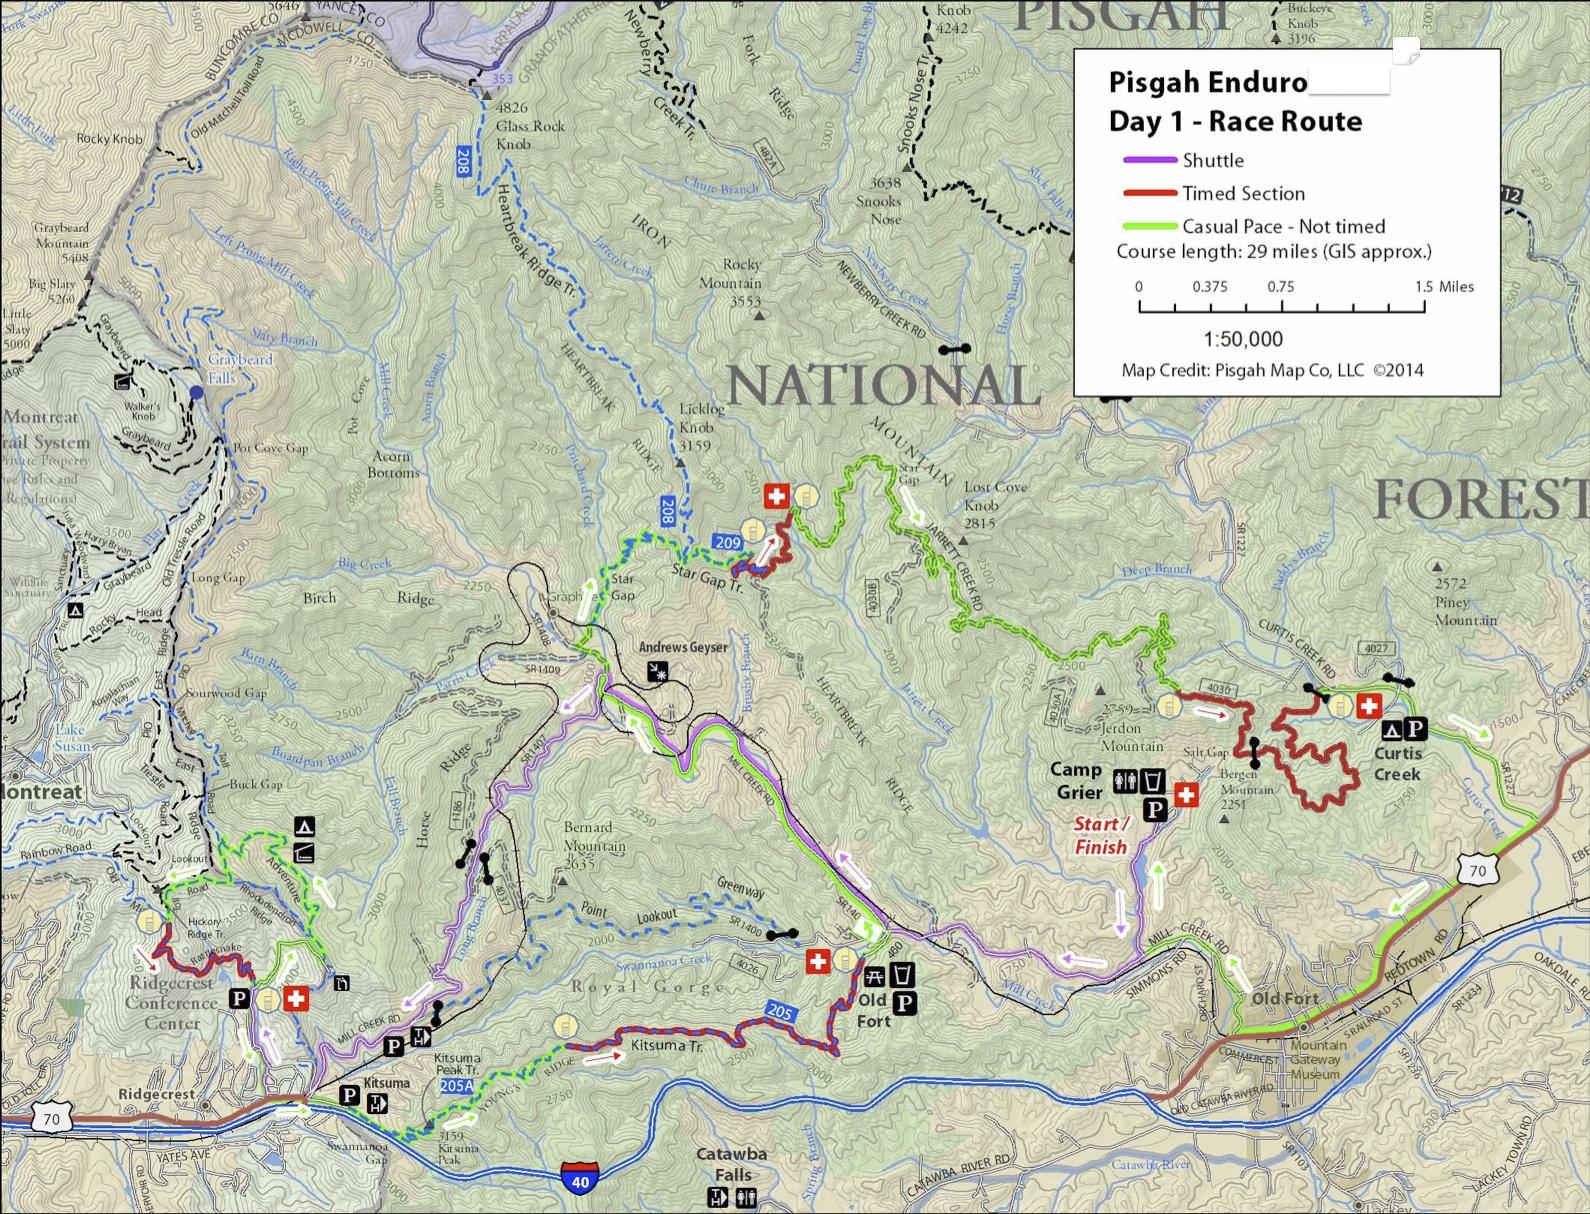 Pisgah Forest Nc Map.Pisgah Productions Pisgah National Forest Pisgah Enduro